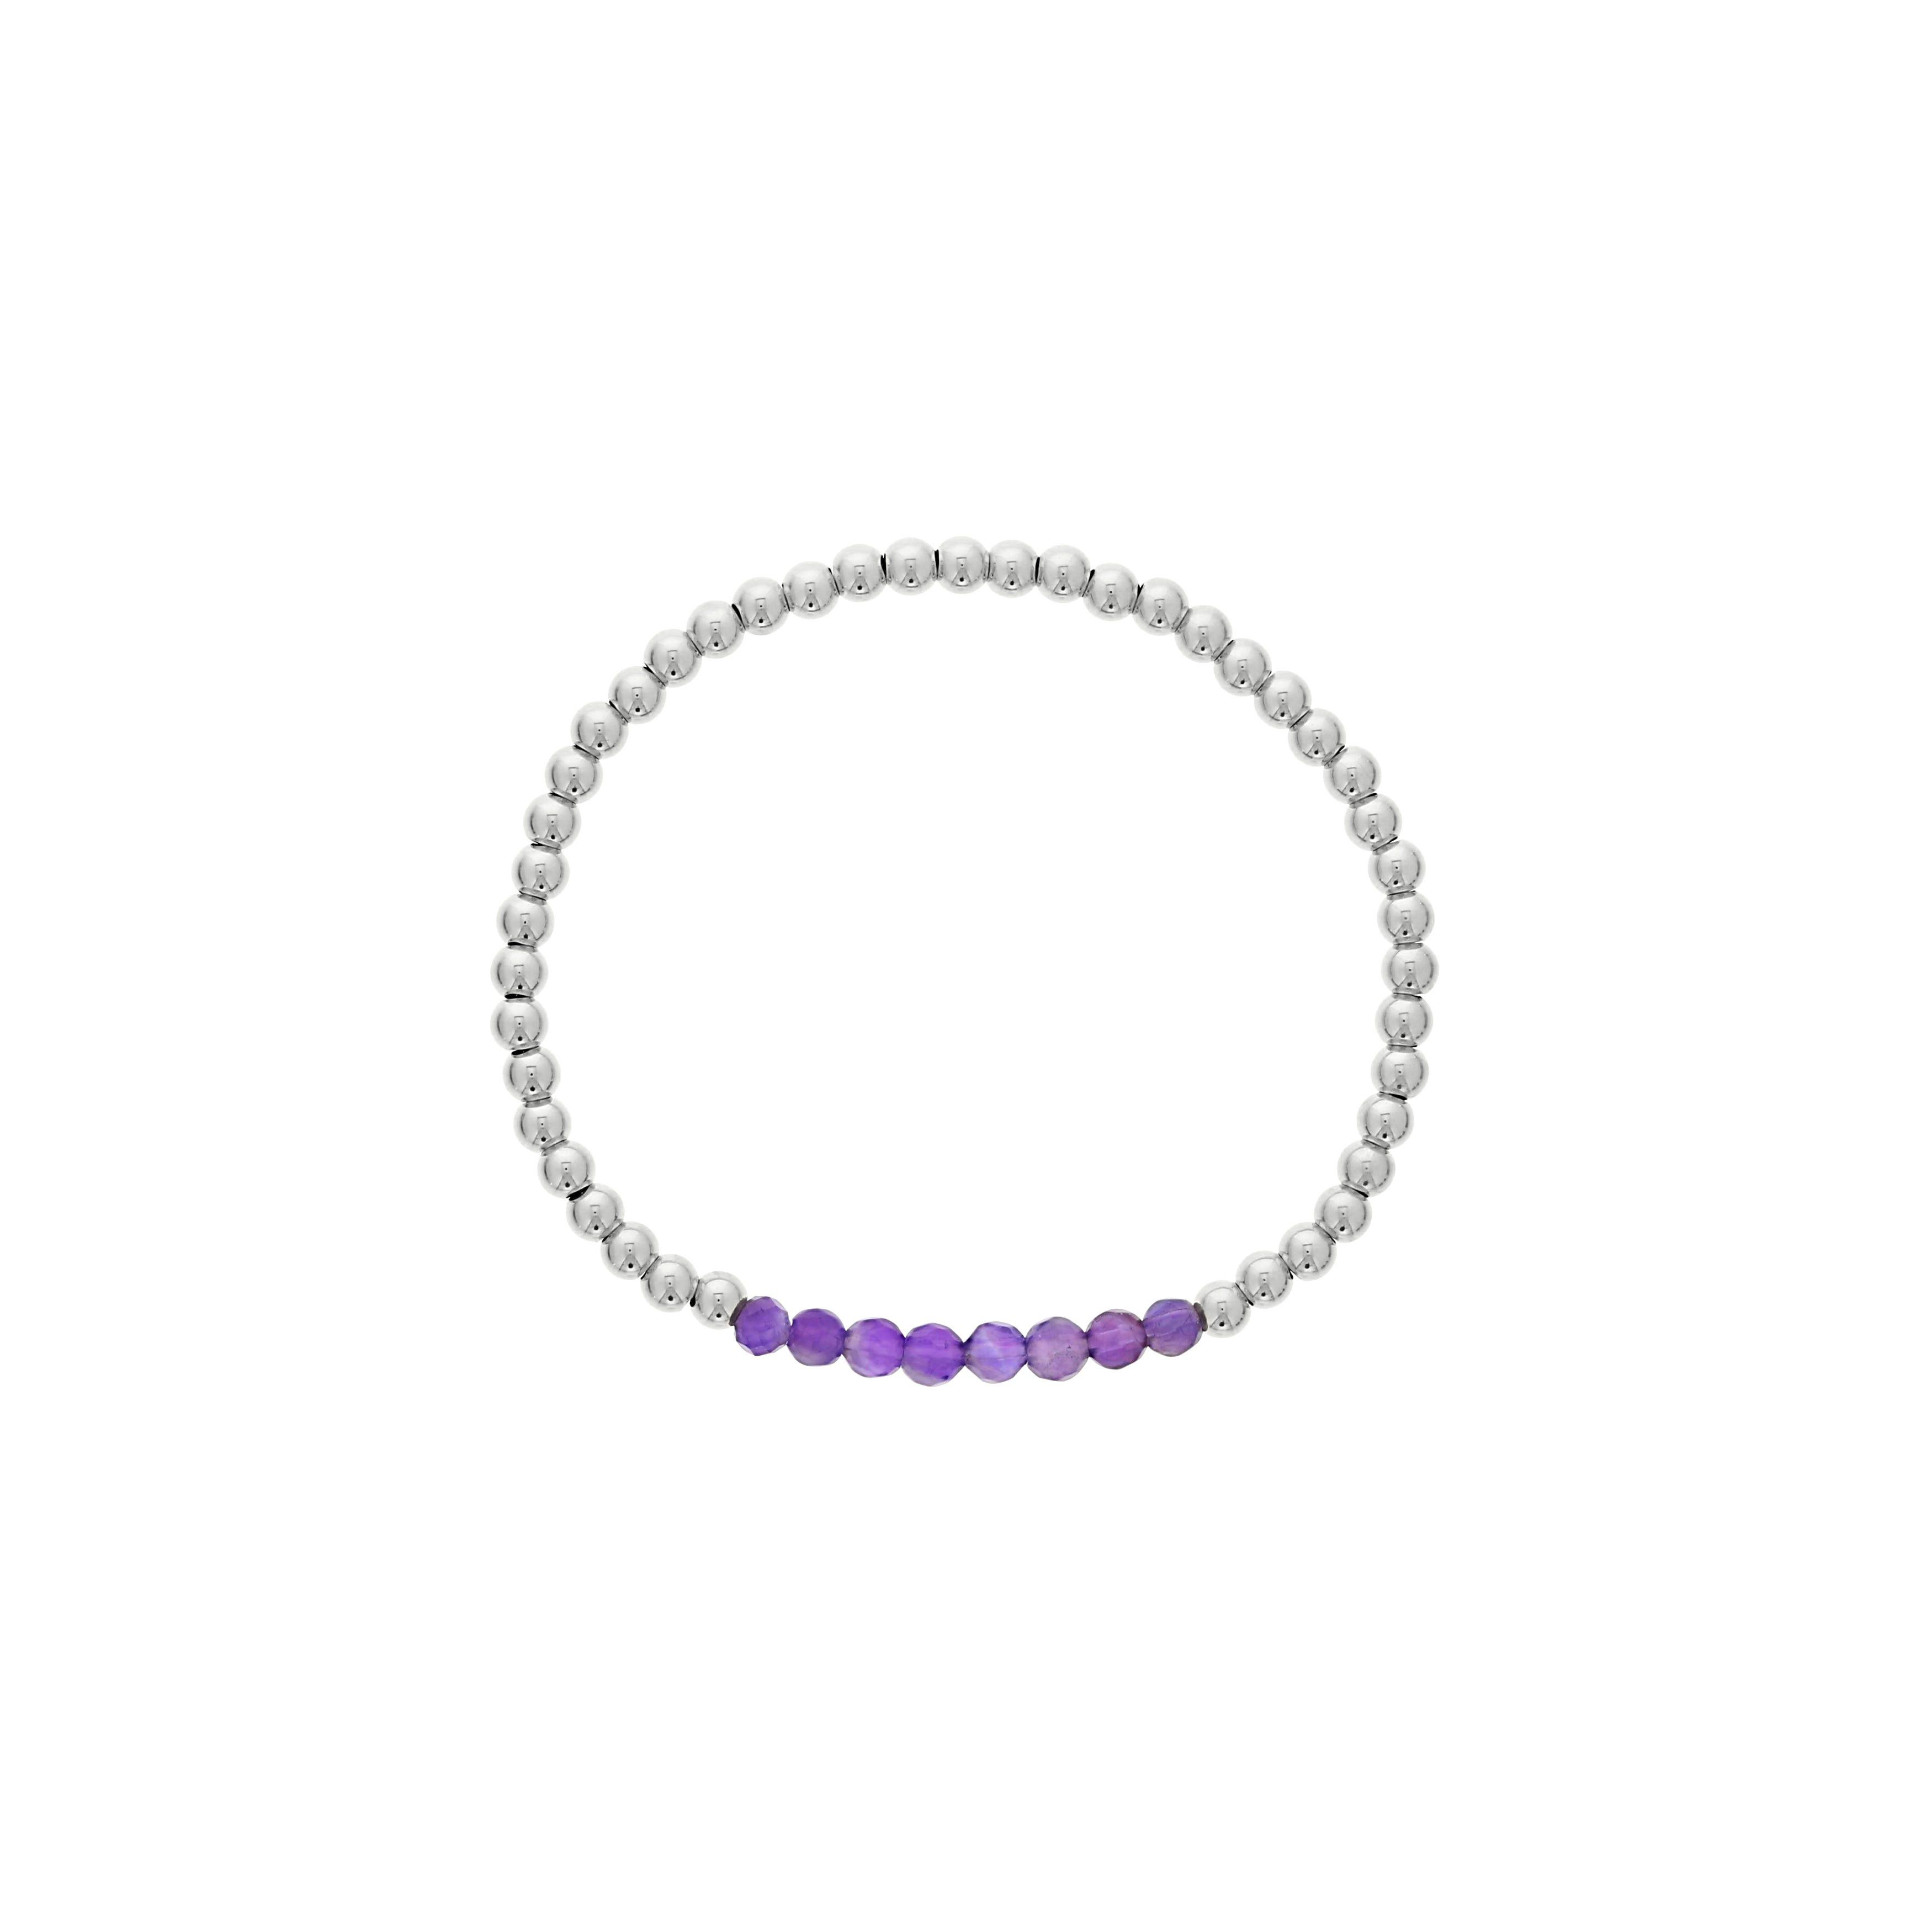 Amethyst Birthstone Beaded Bracelet in Sterling Silver